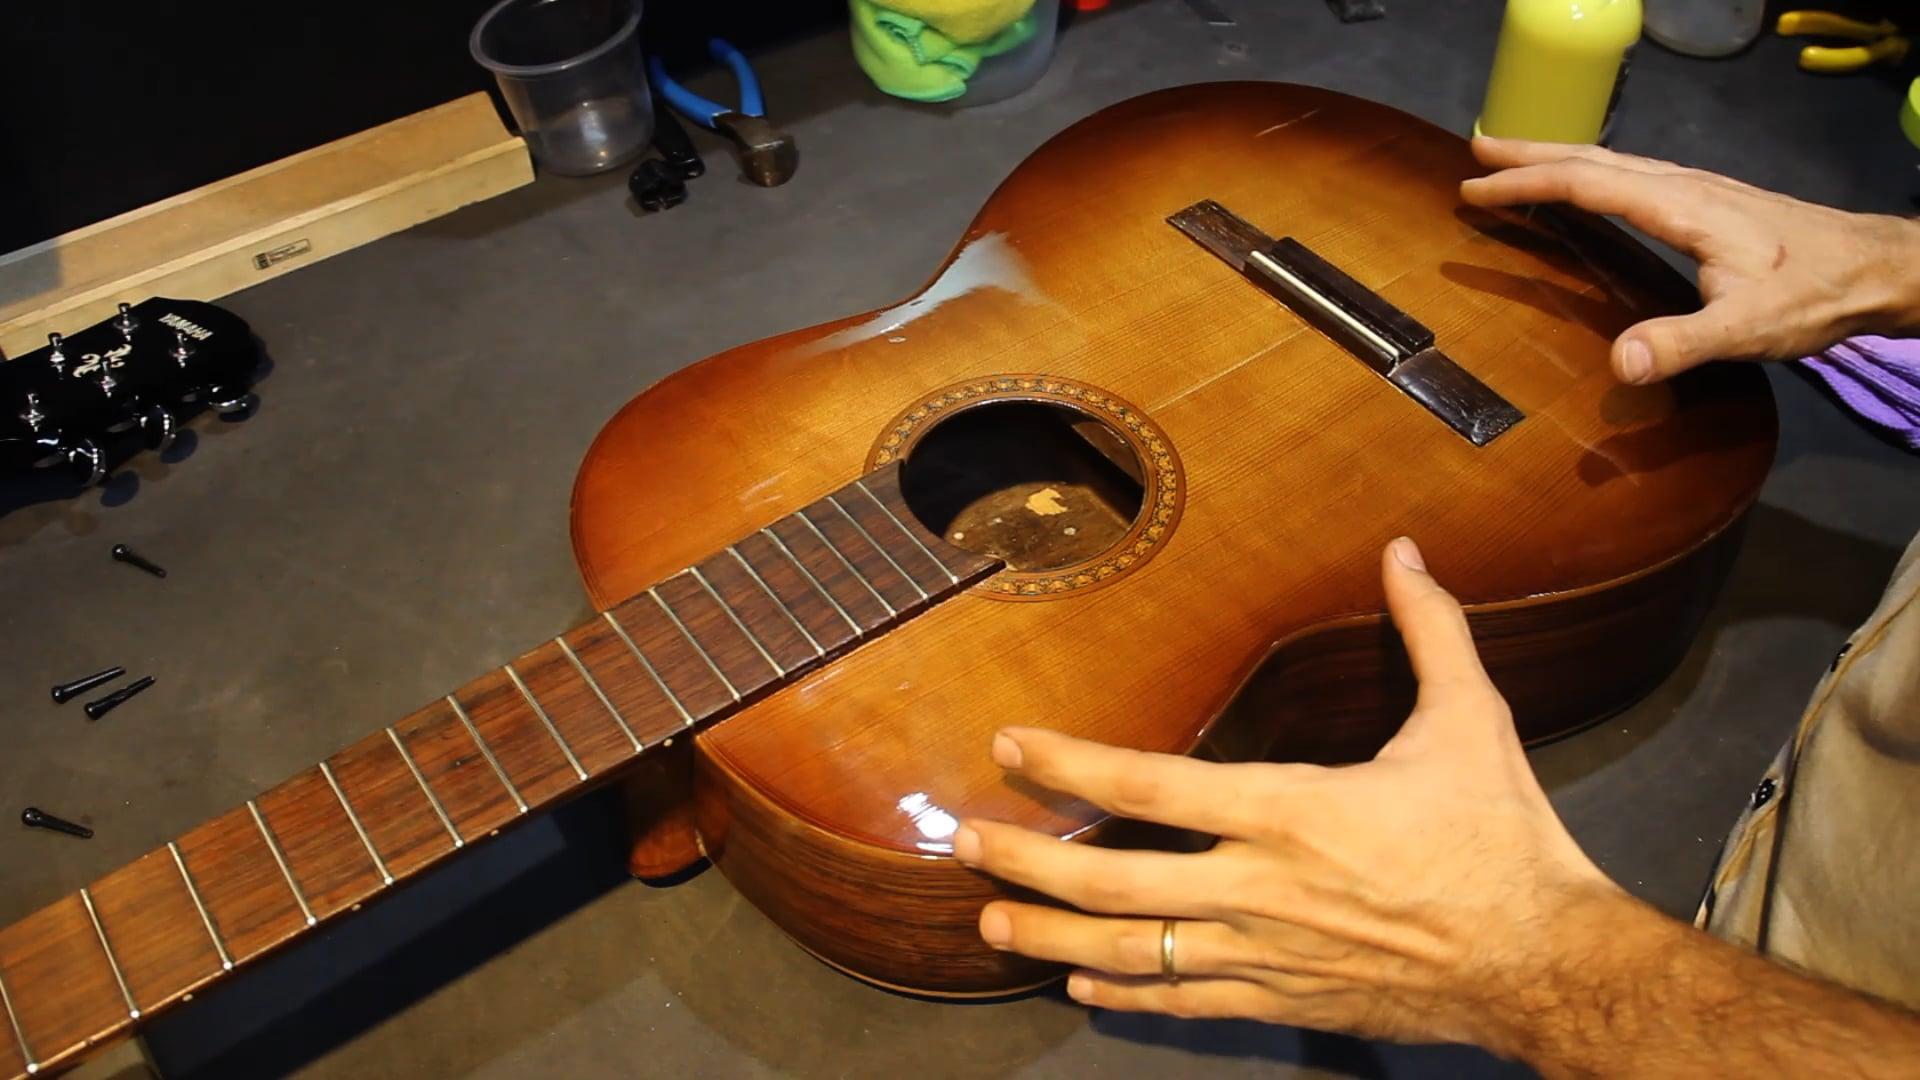 Limpeza e Troca de Cordas para Instrumentos Acústicos - Parte 2